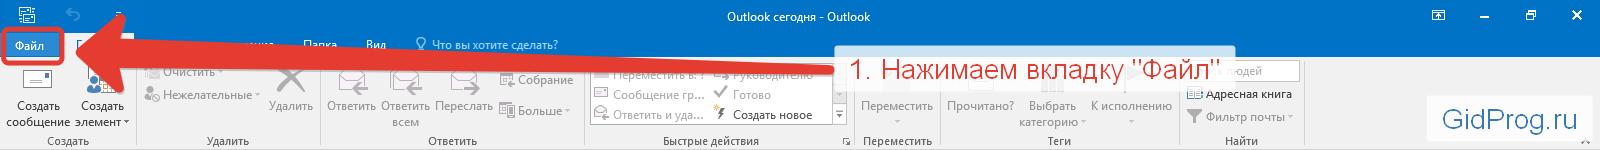 Вкладка файл в outlook